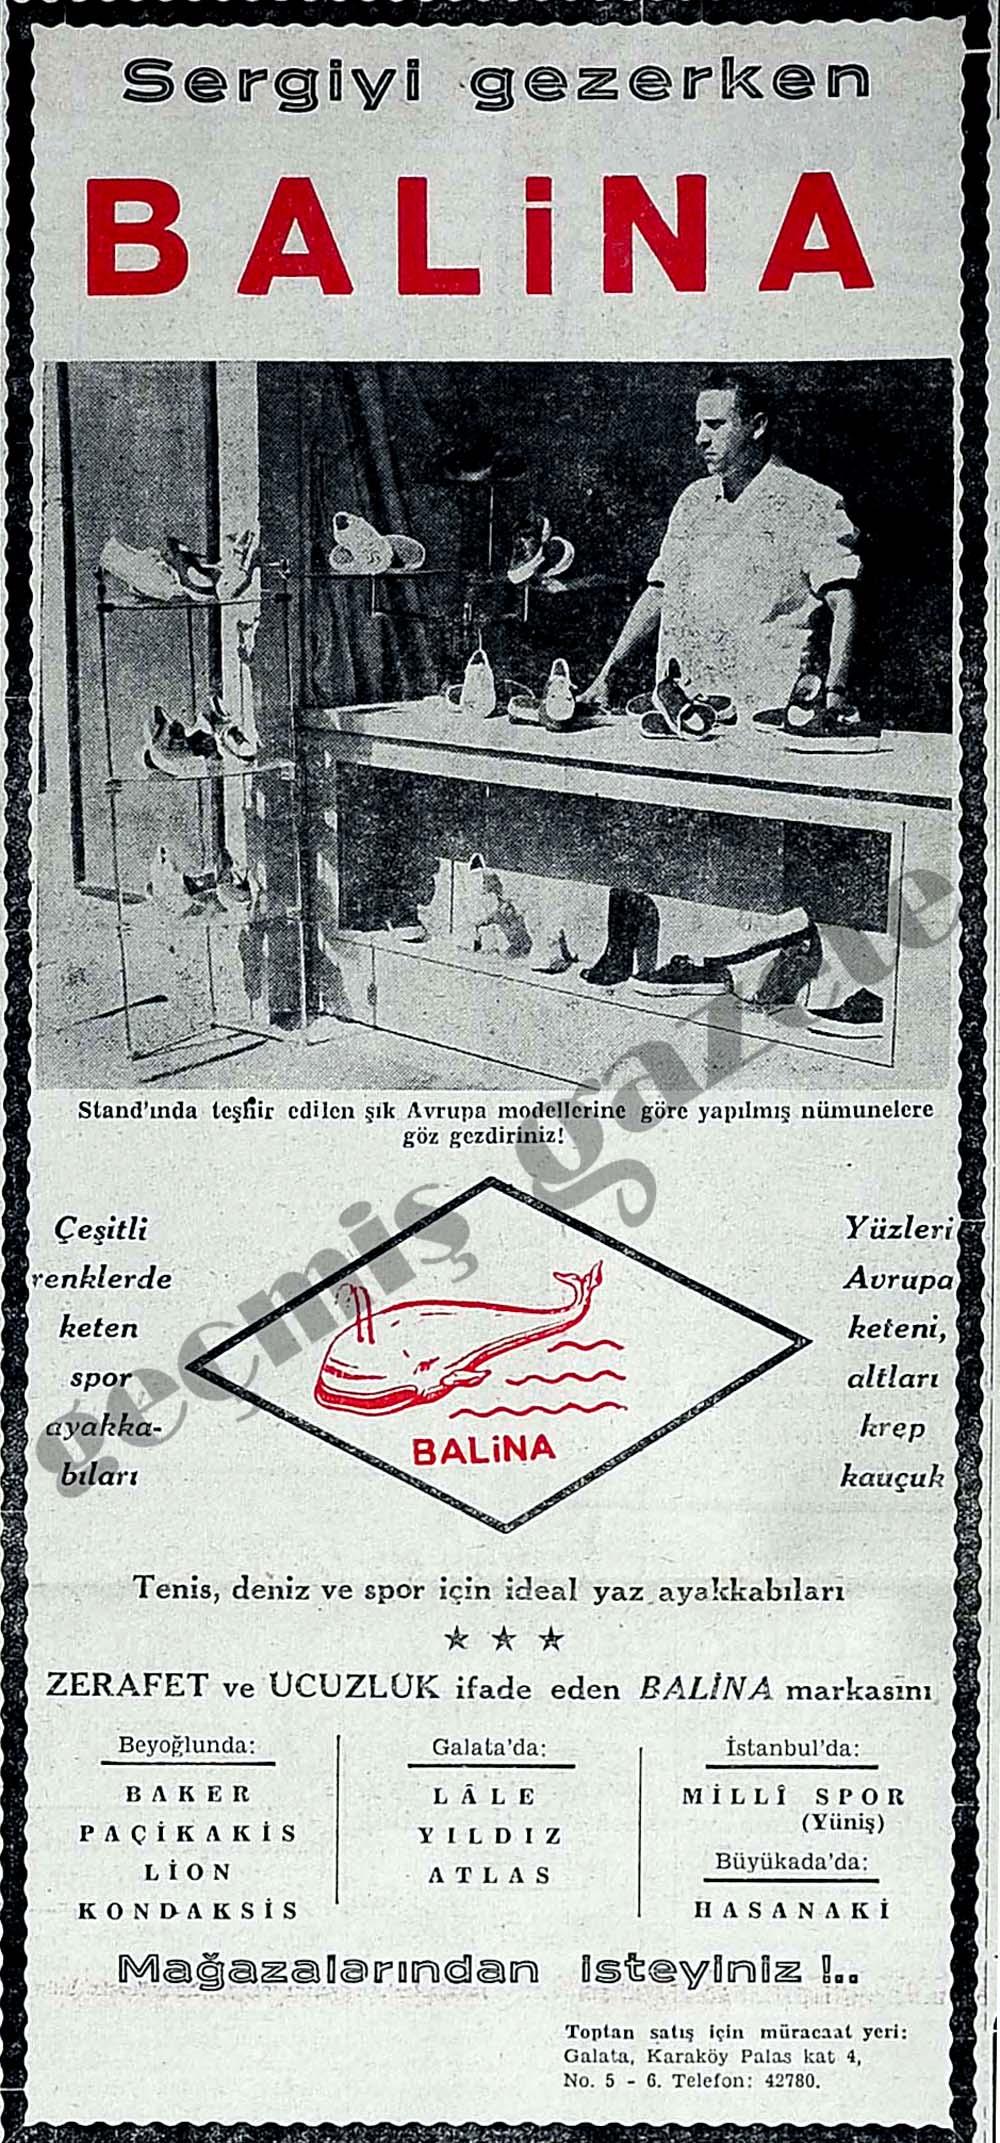 Sergiyi gezerken Balina